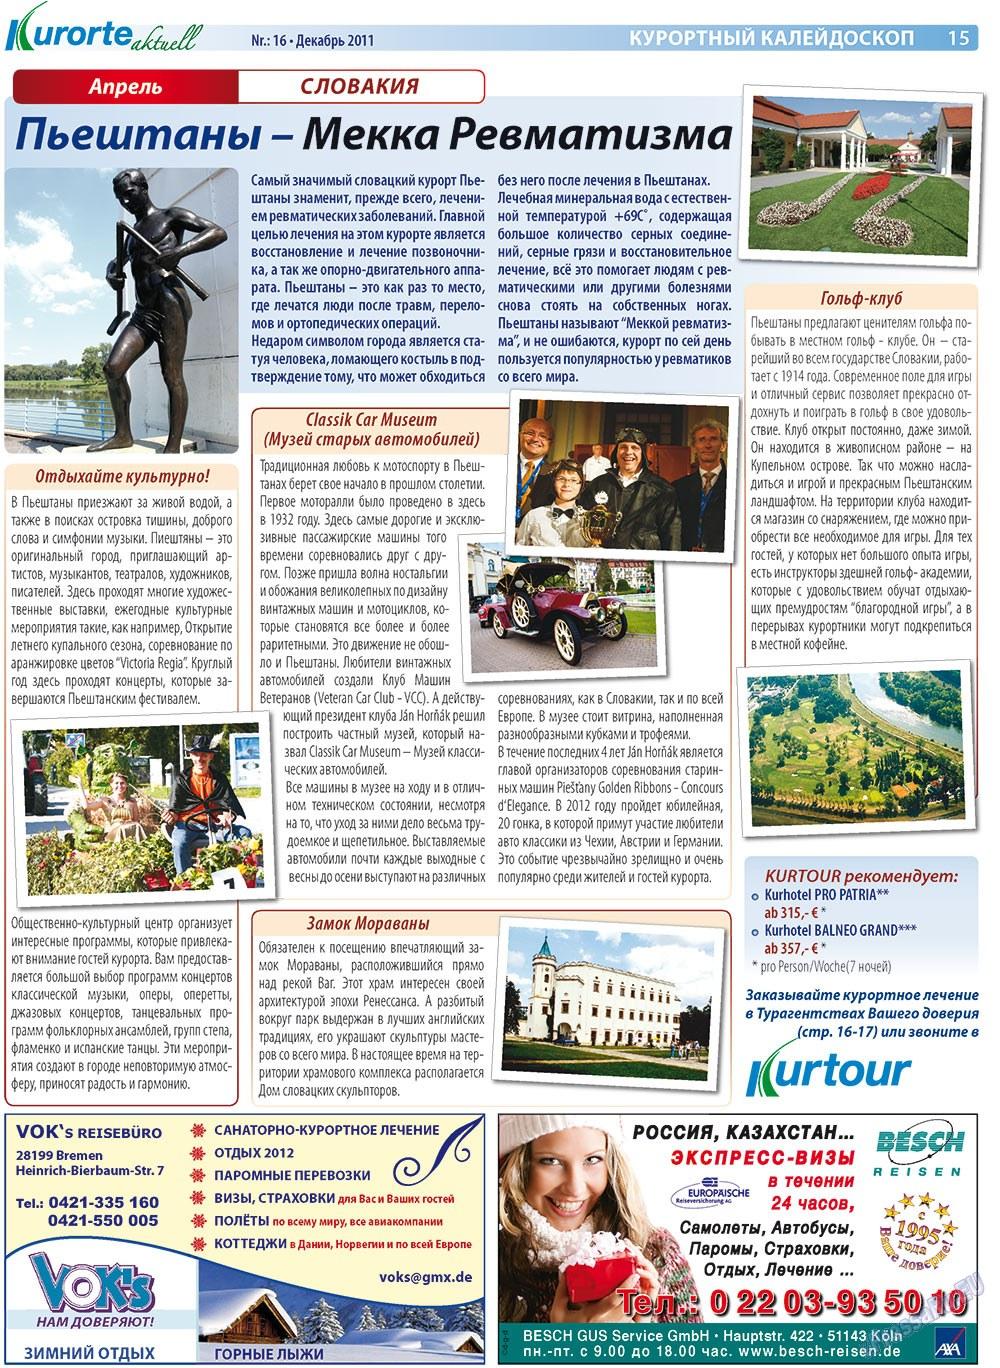 Kurorte aktuell (газета). 2011 год, номер 12, стр. 15